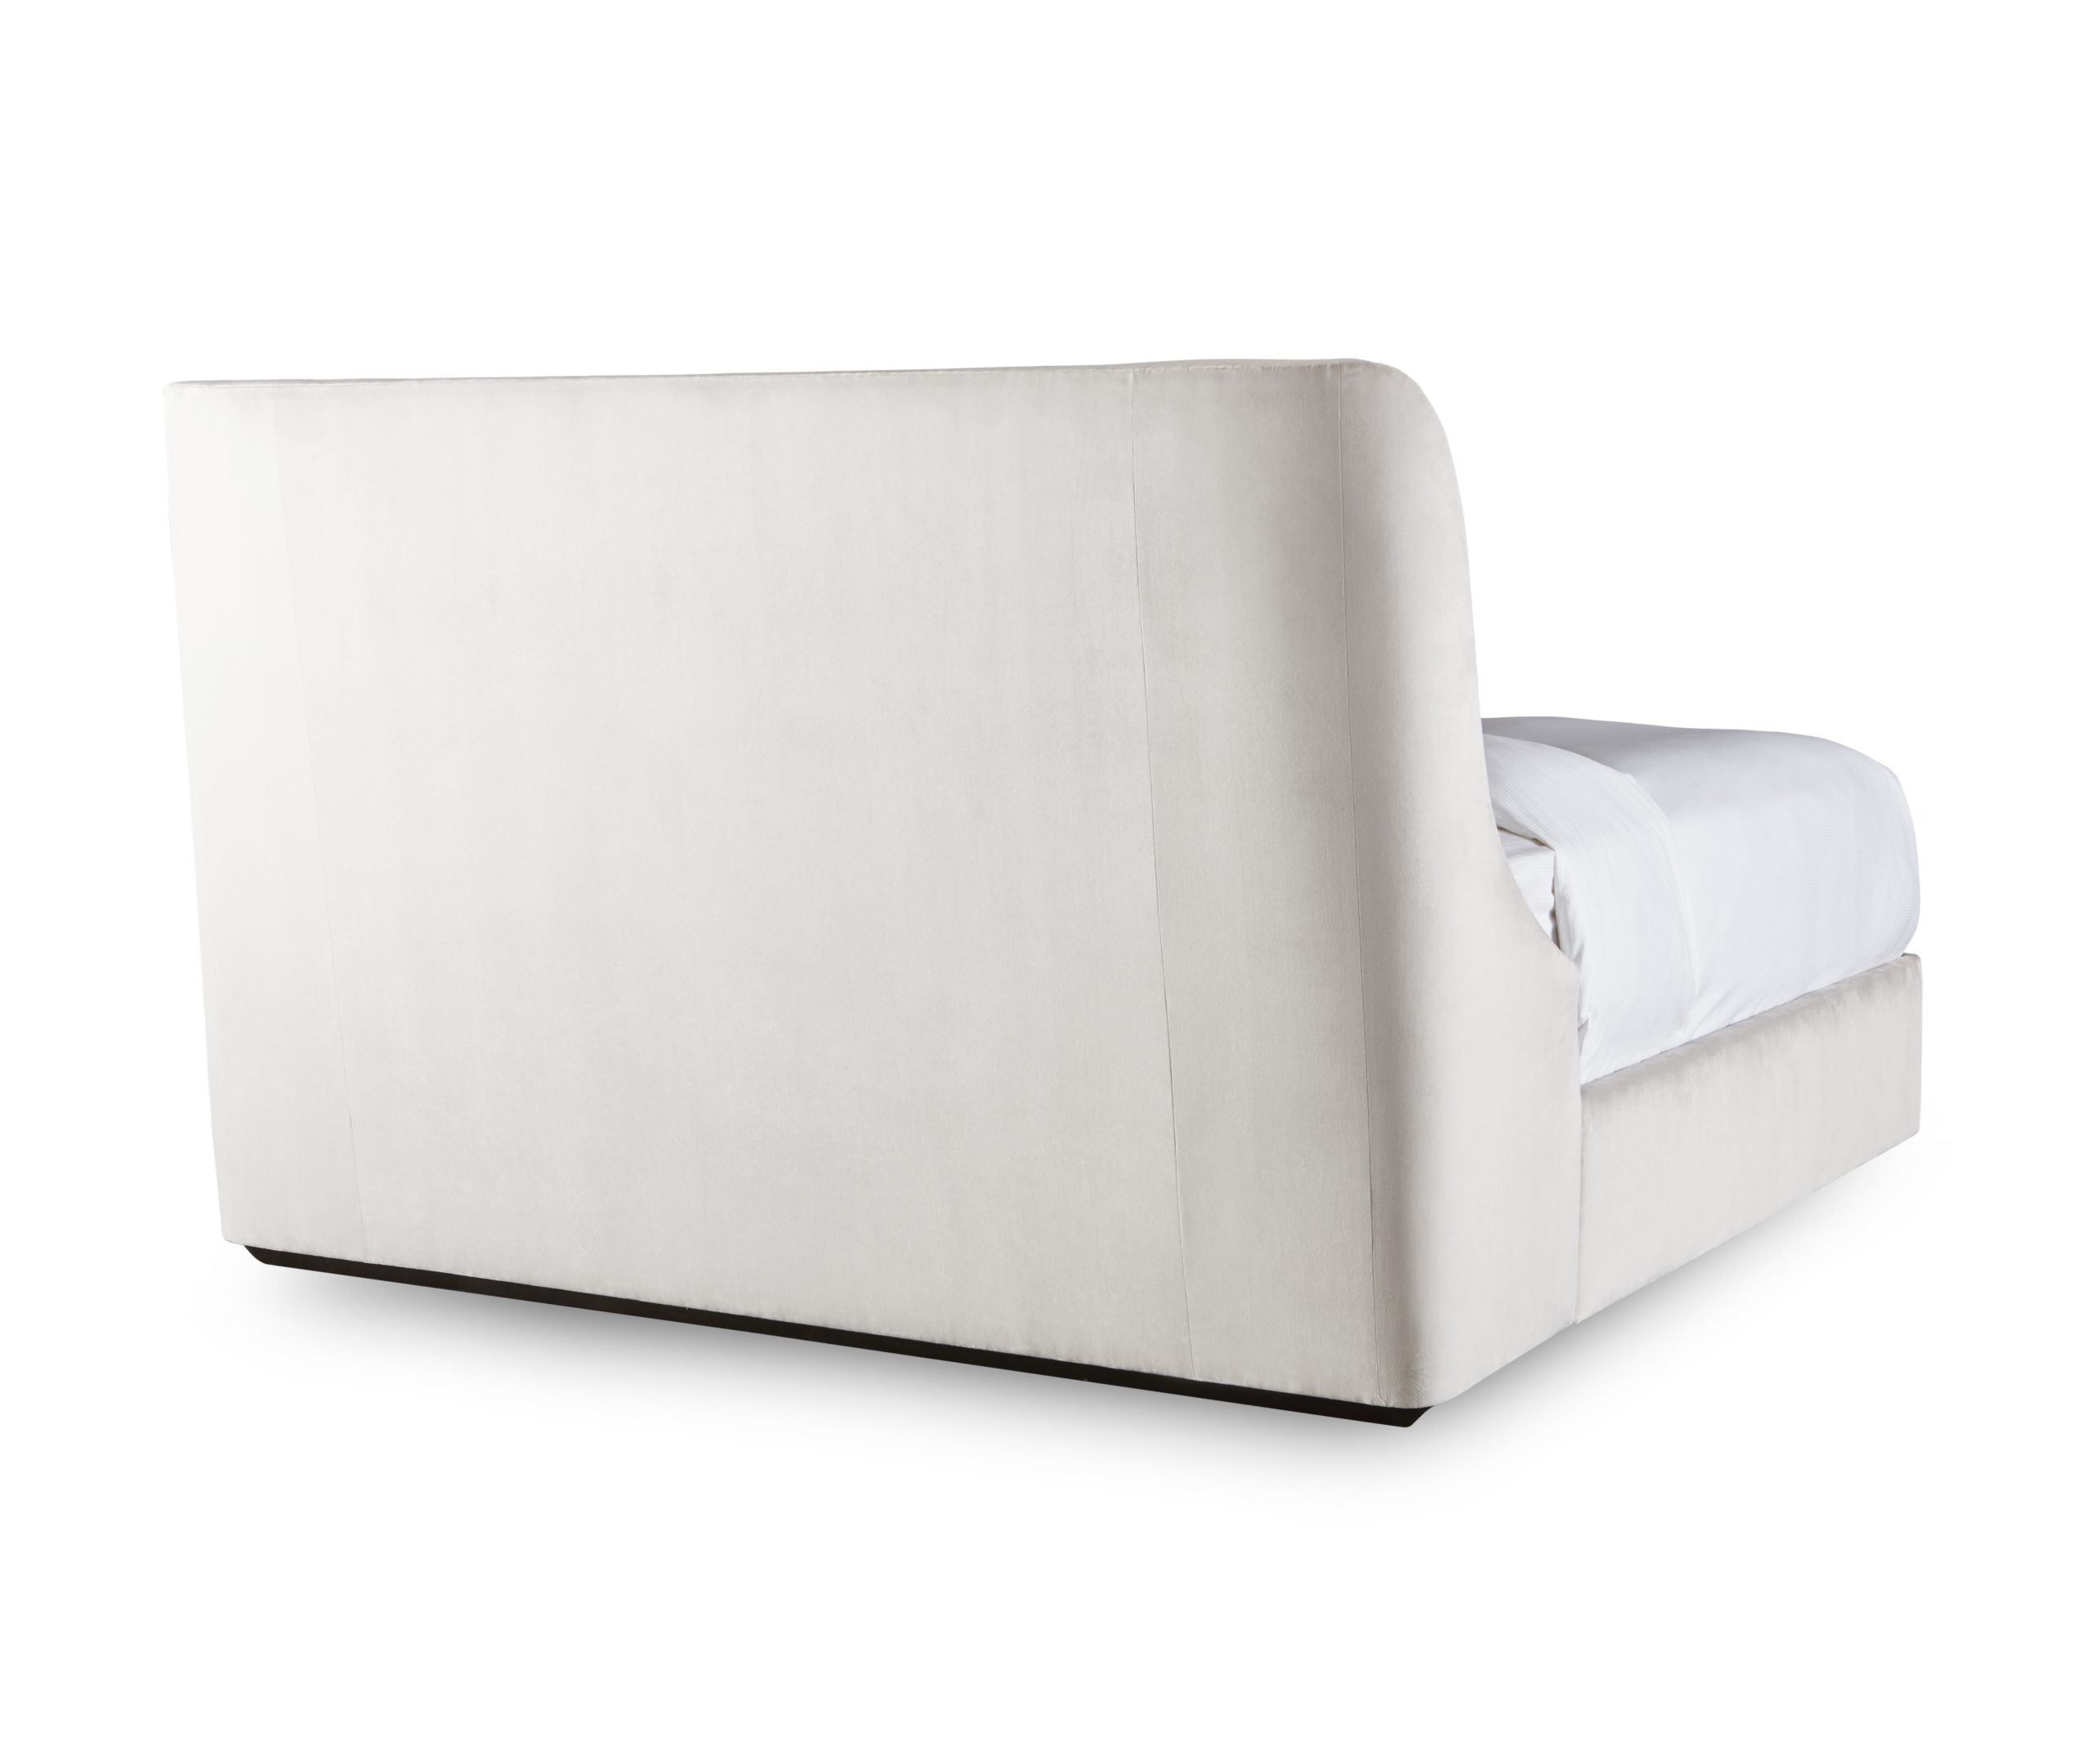 Baker_products_WNWN_casanova_bed_BAA3020_BACK_3QRT-scaled-2